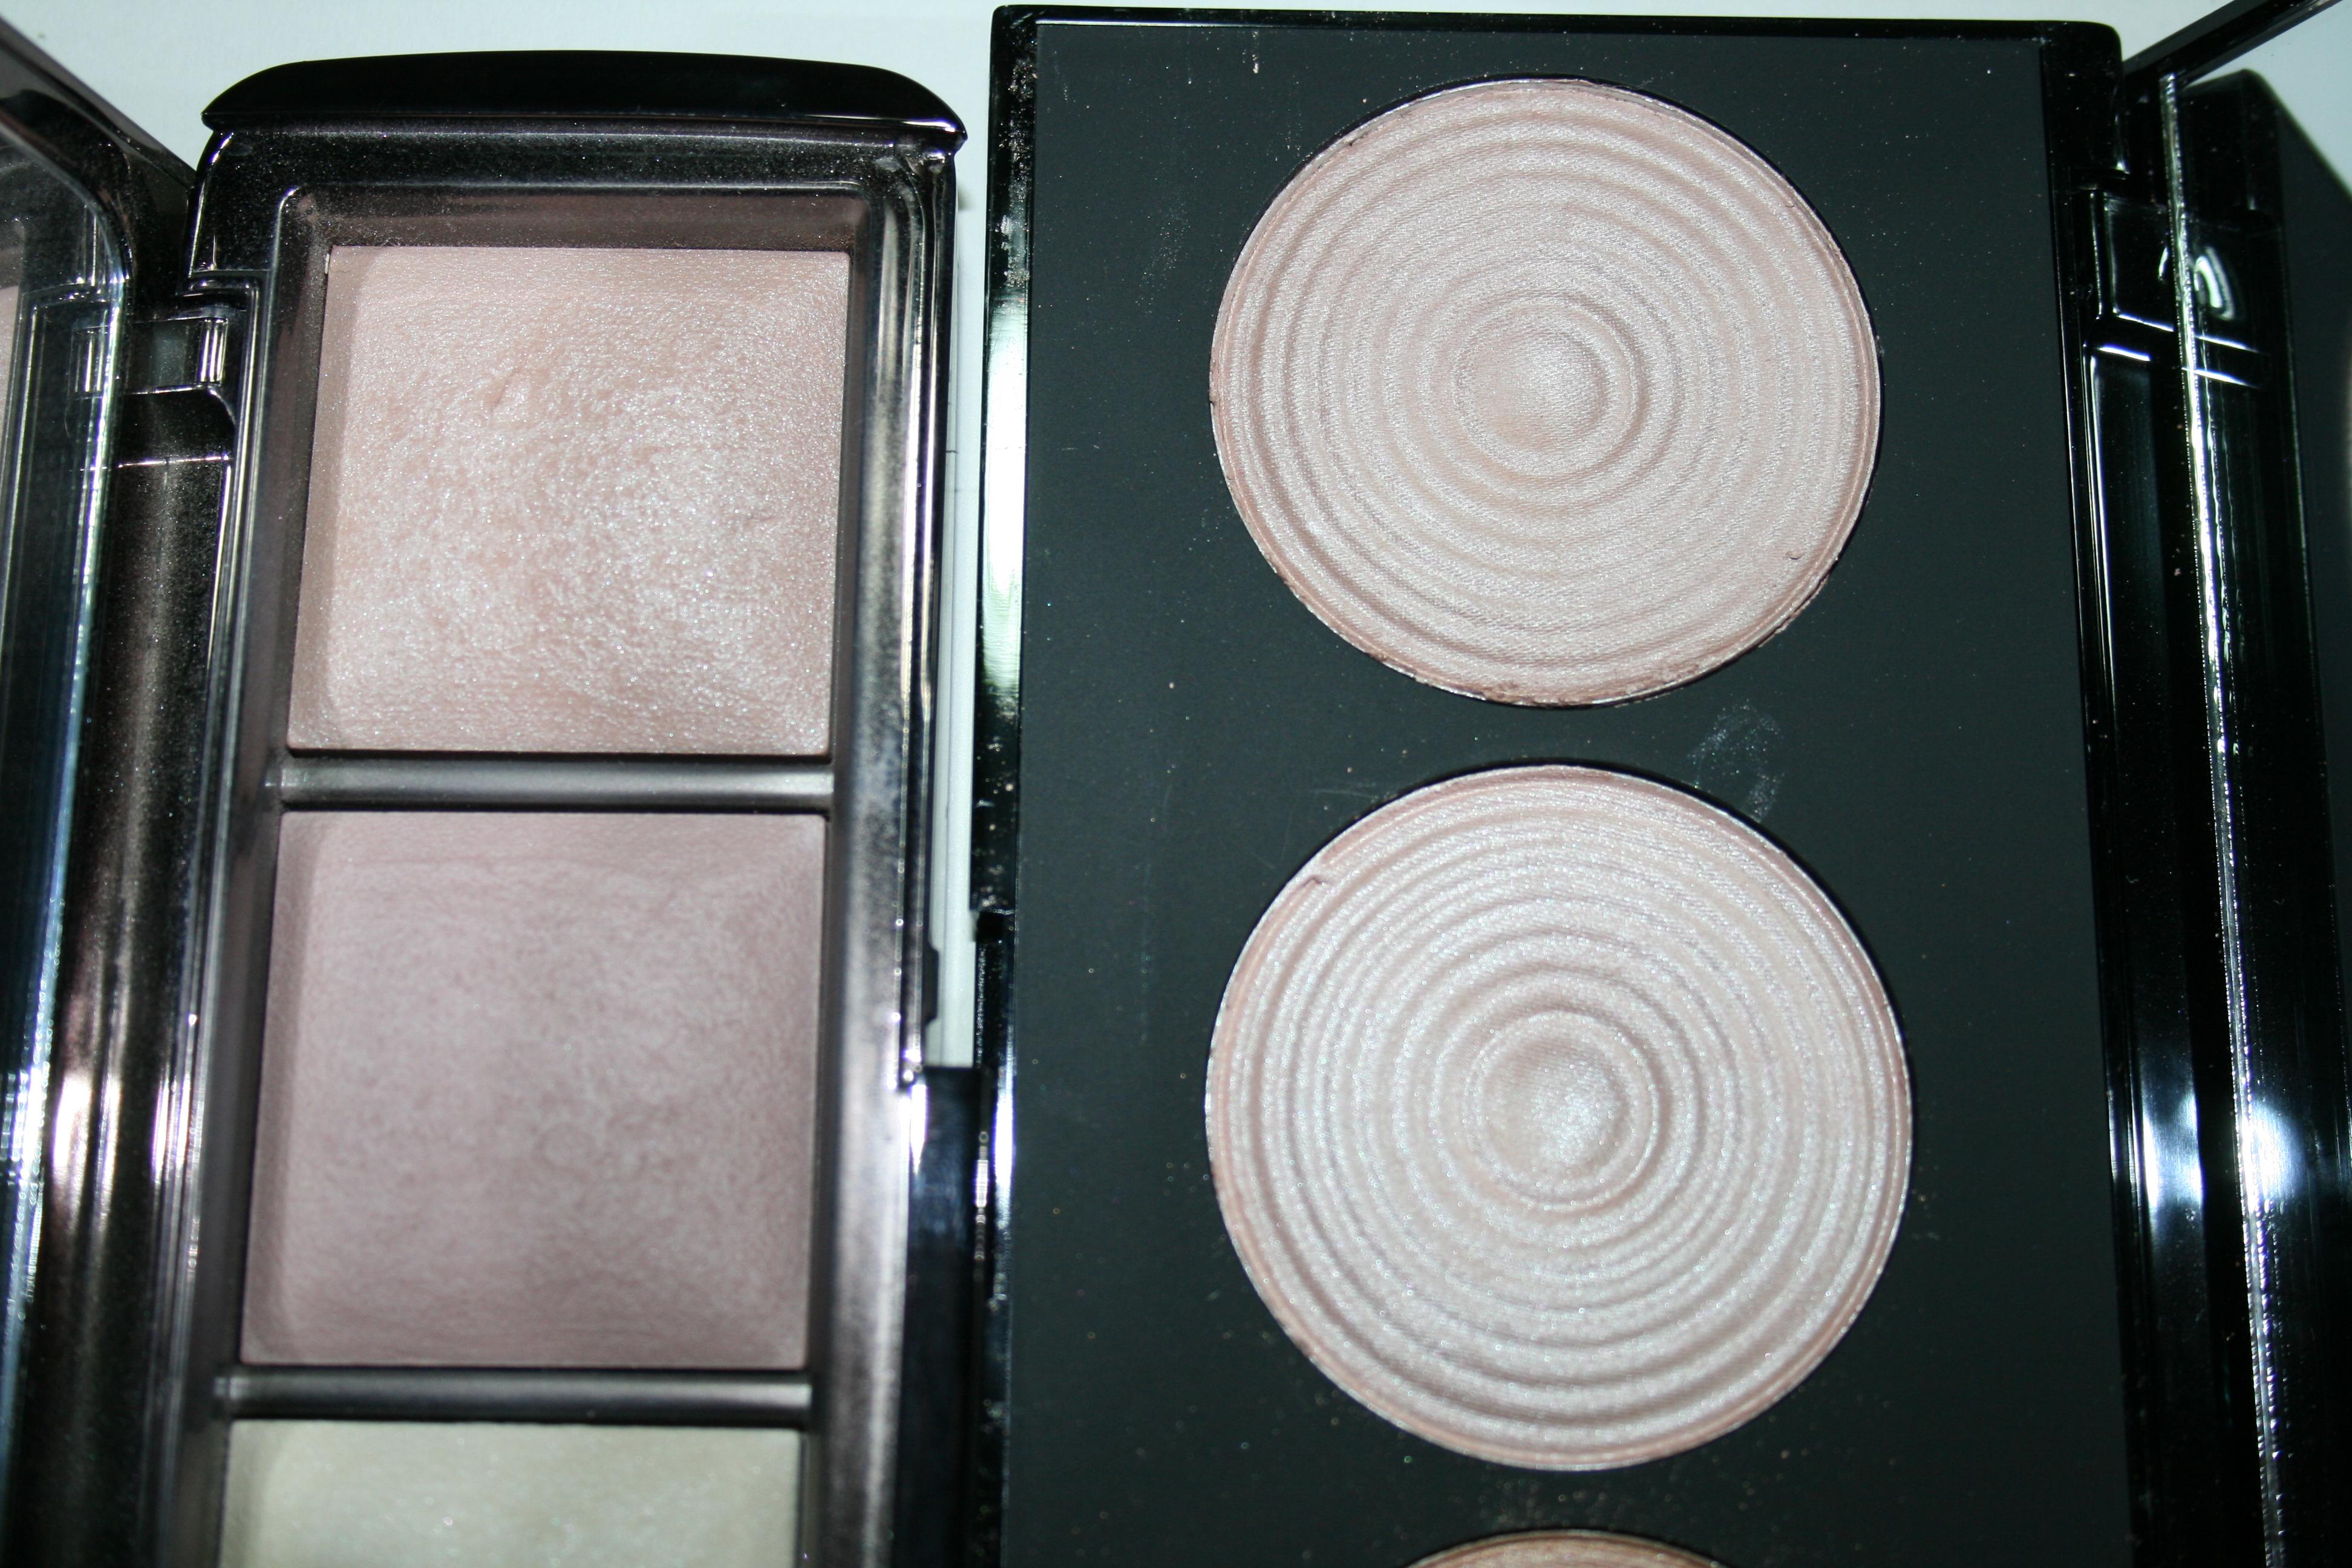 Makeup revolution highlighter palette radiance review